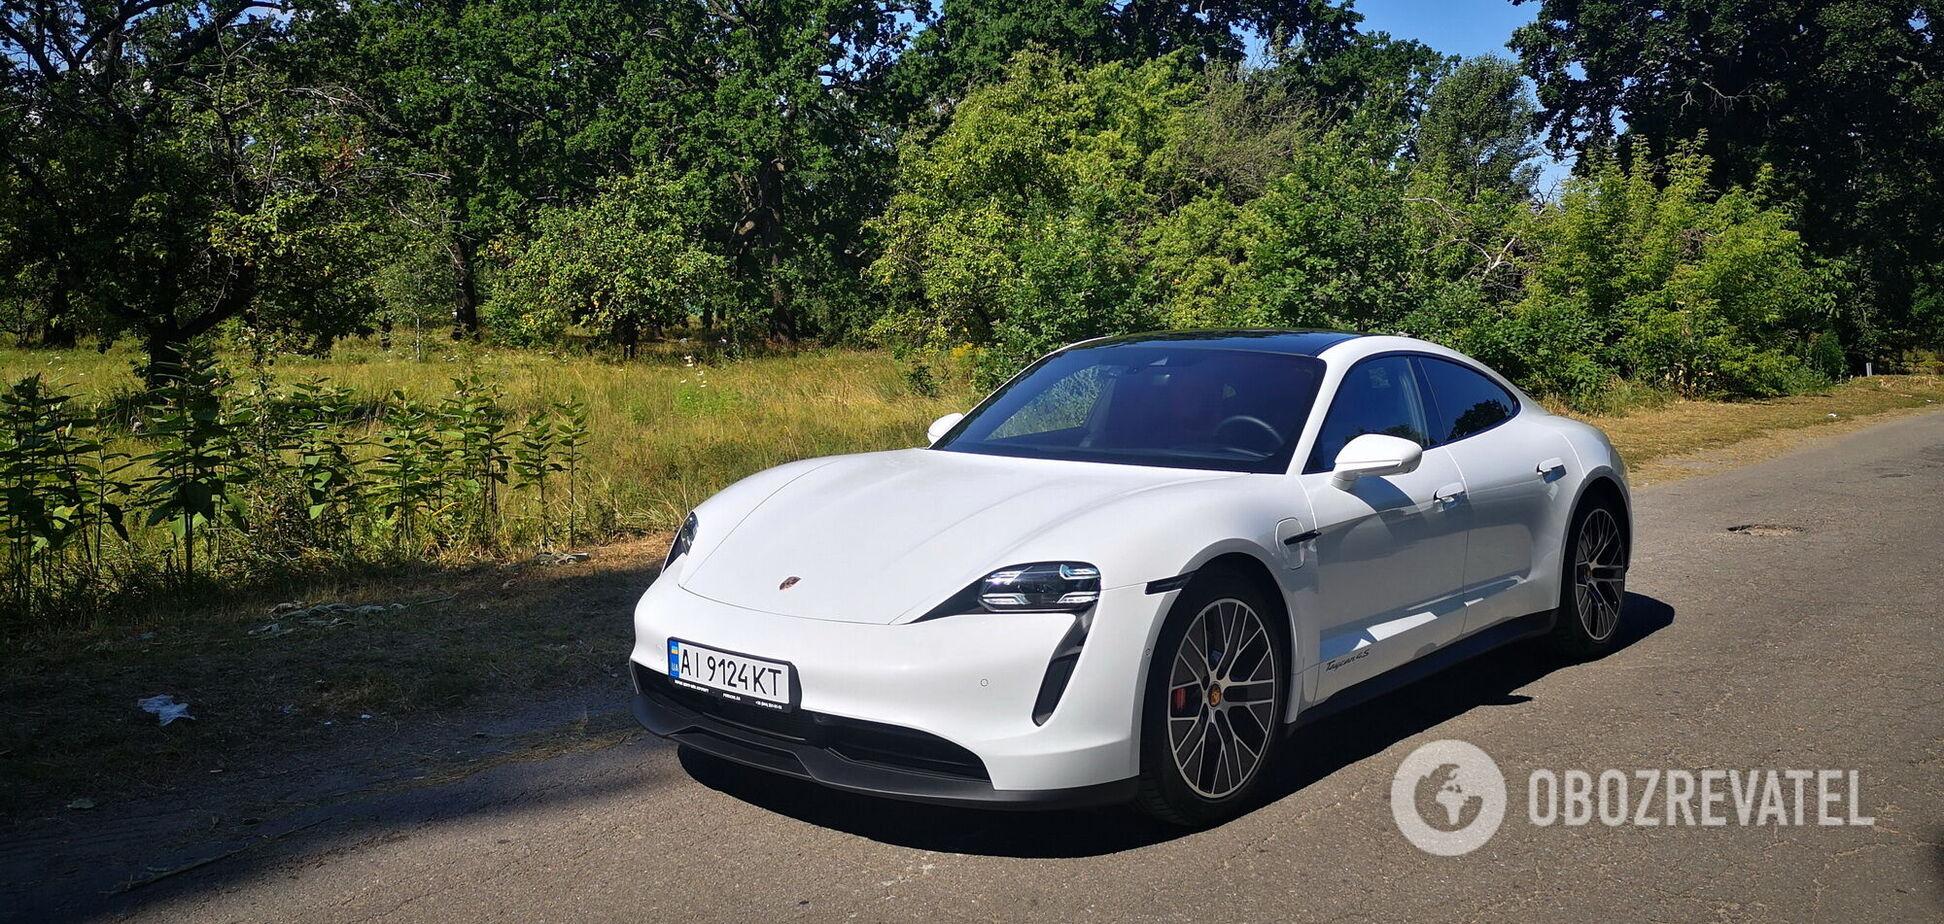 Електрична сила: тестуємо спорткар Porsche Taycan